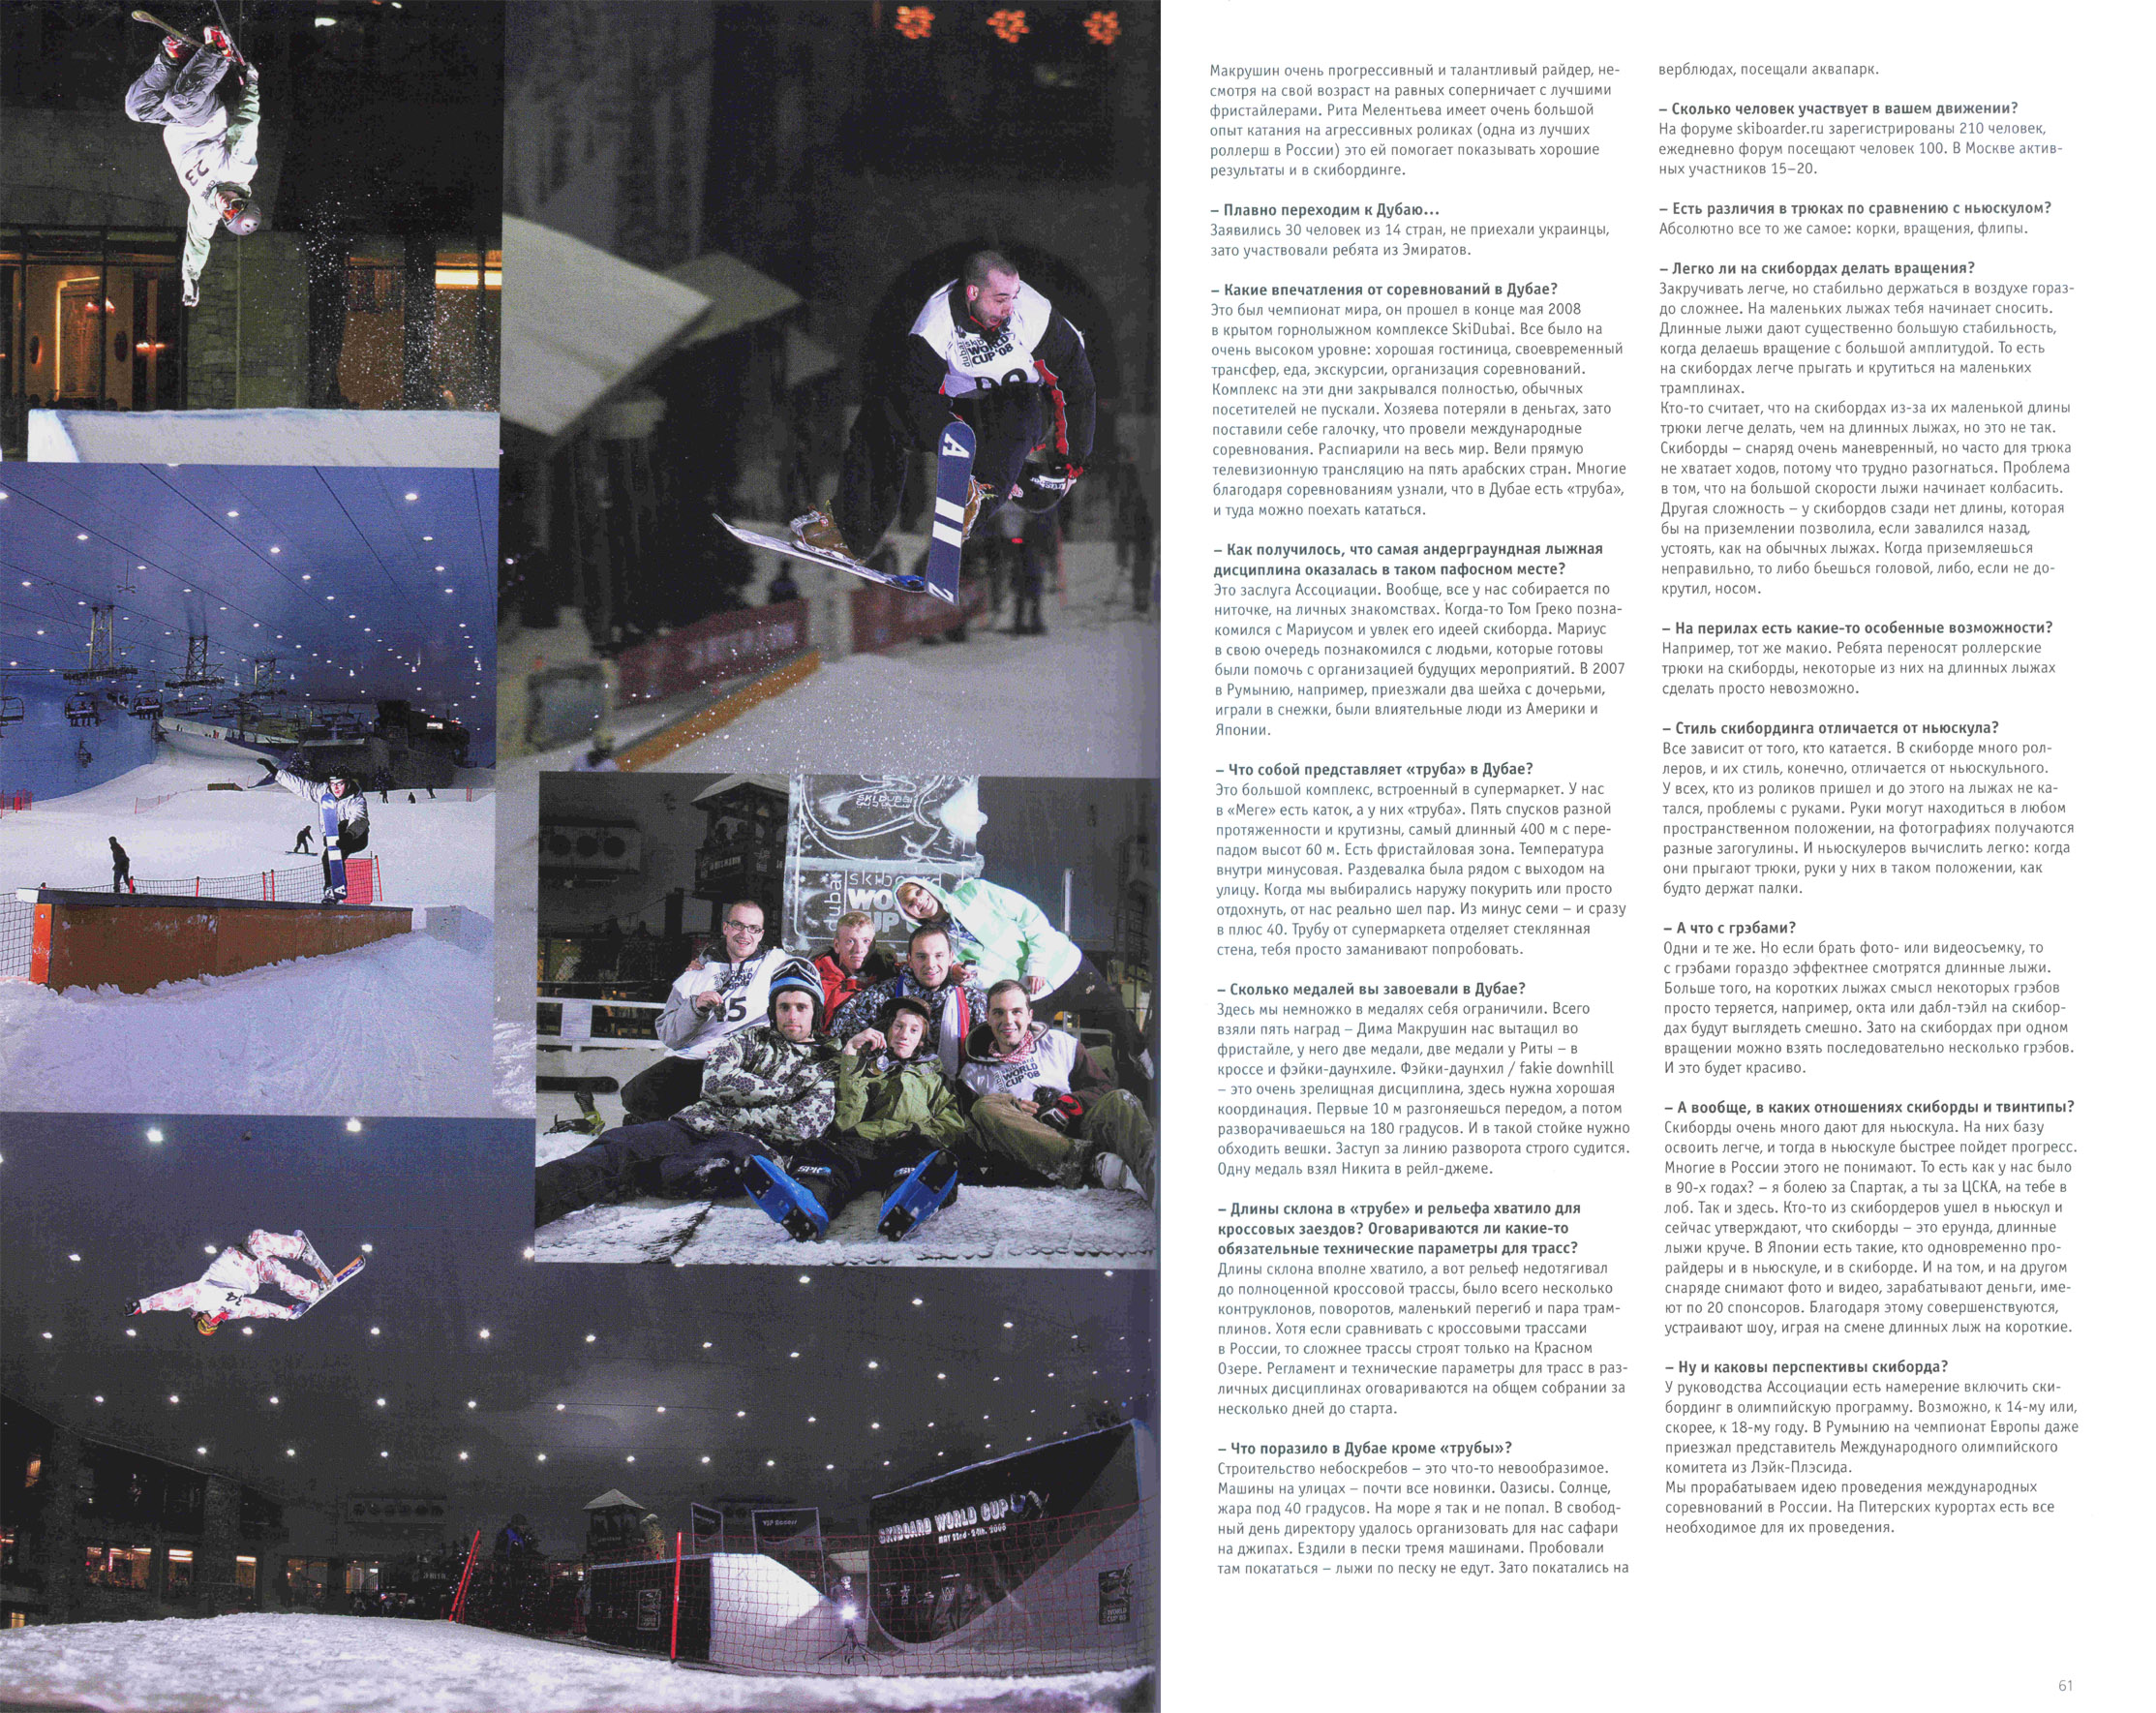 Пятая и Шестая полосы в журнале Ski Style